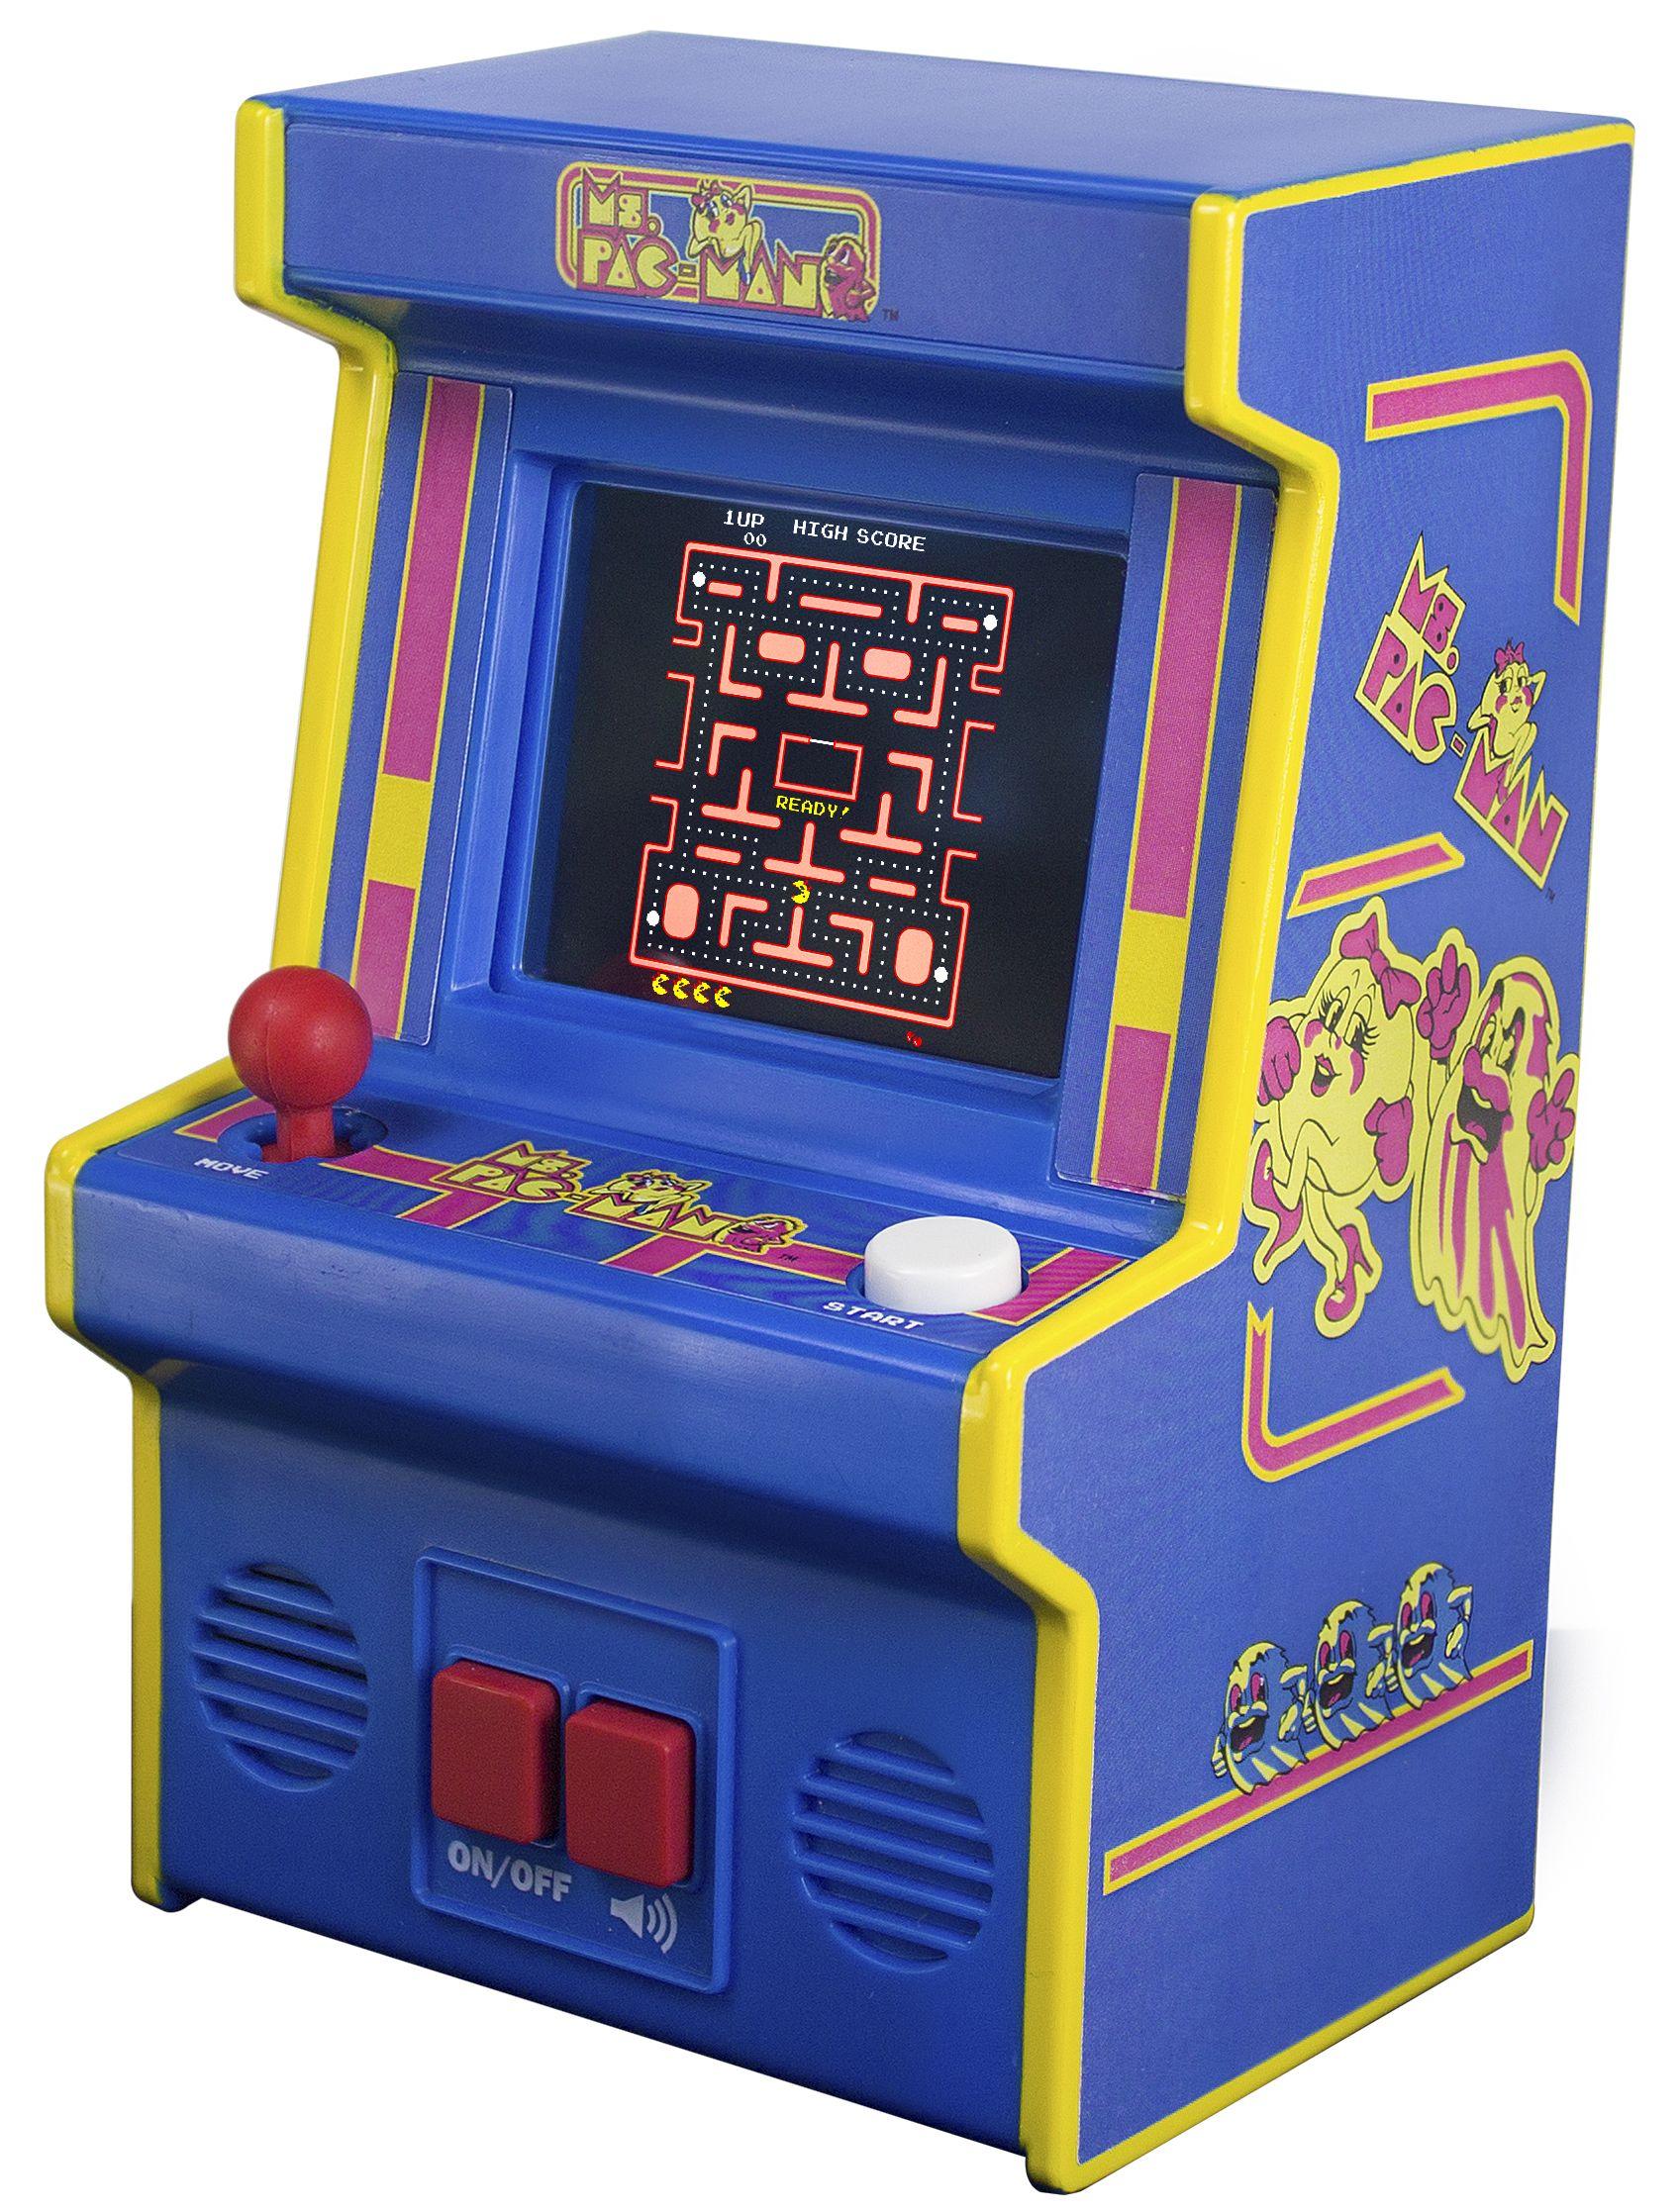 Image result for arcade classics ms pacman Mini arcade